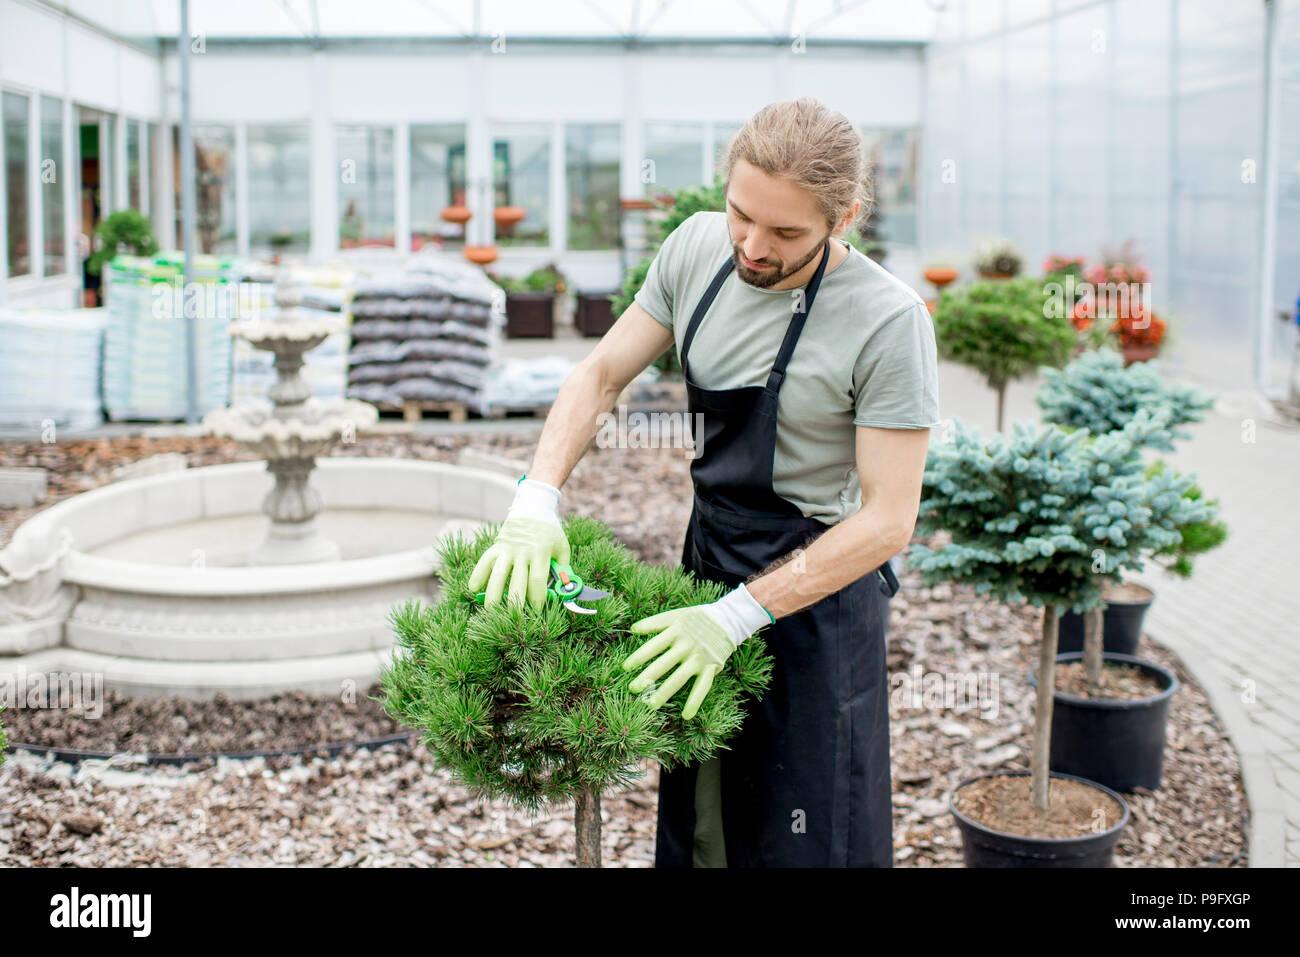 Gartenpflege stockfotos gartenpflege bilder alamy for Garten arbeiten